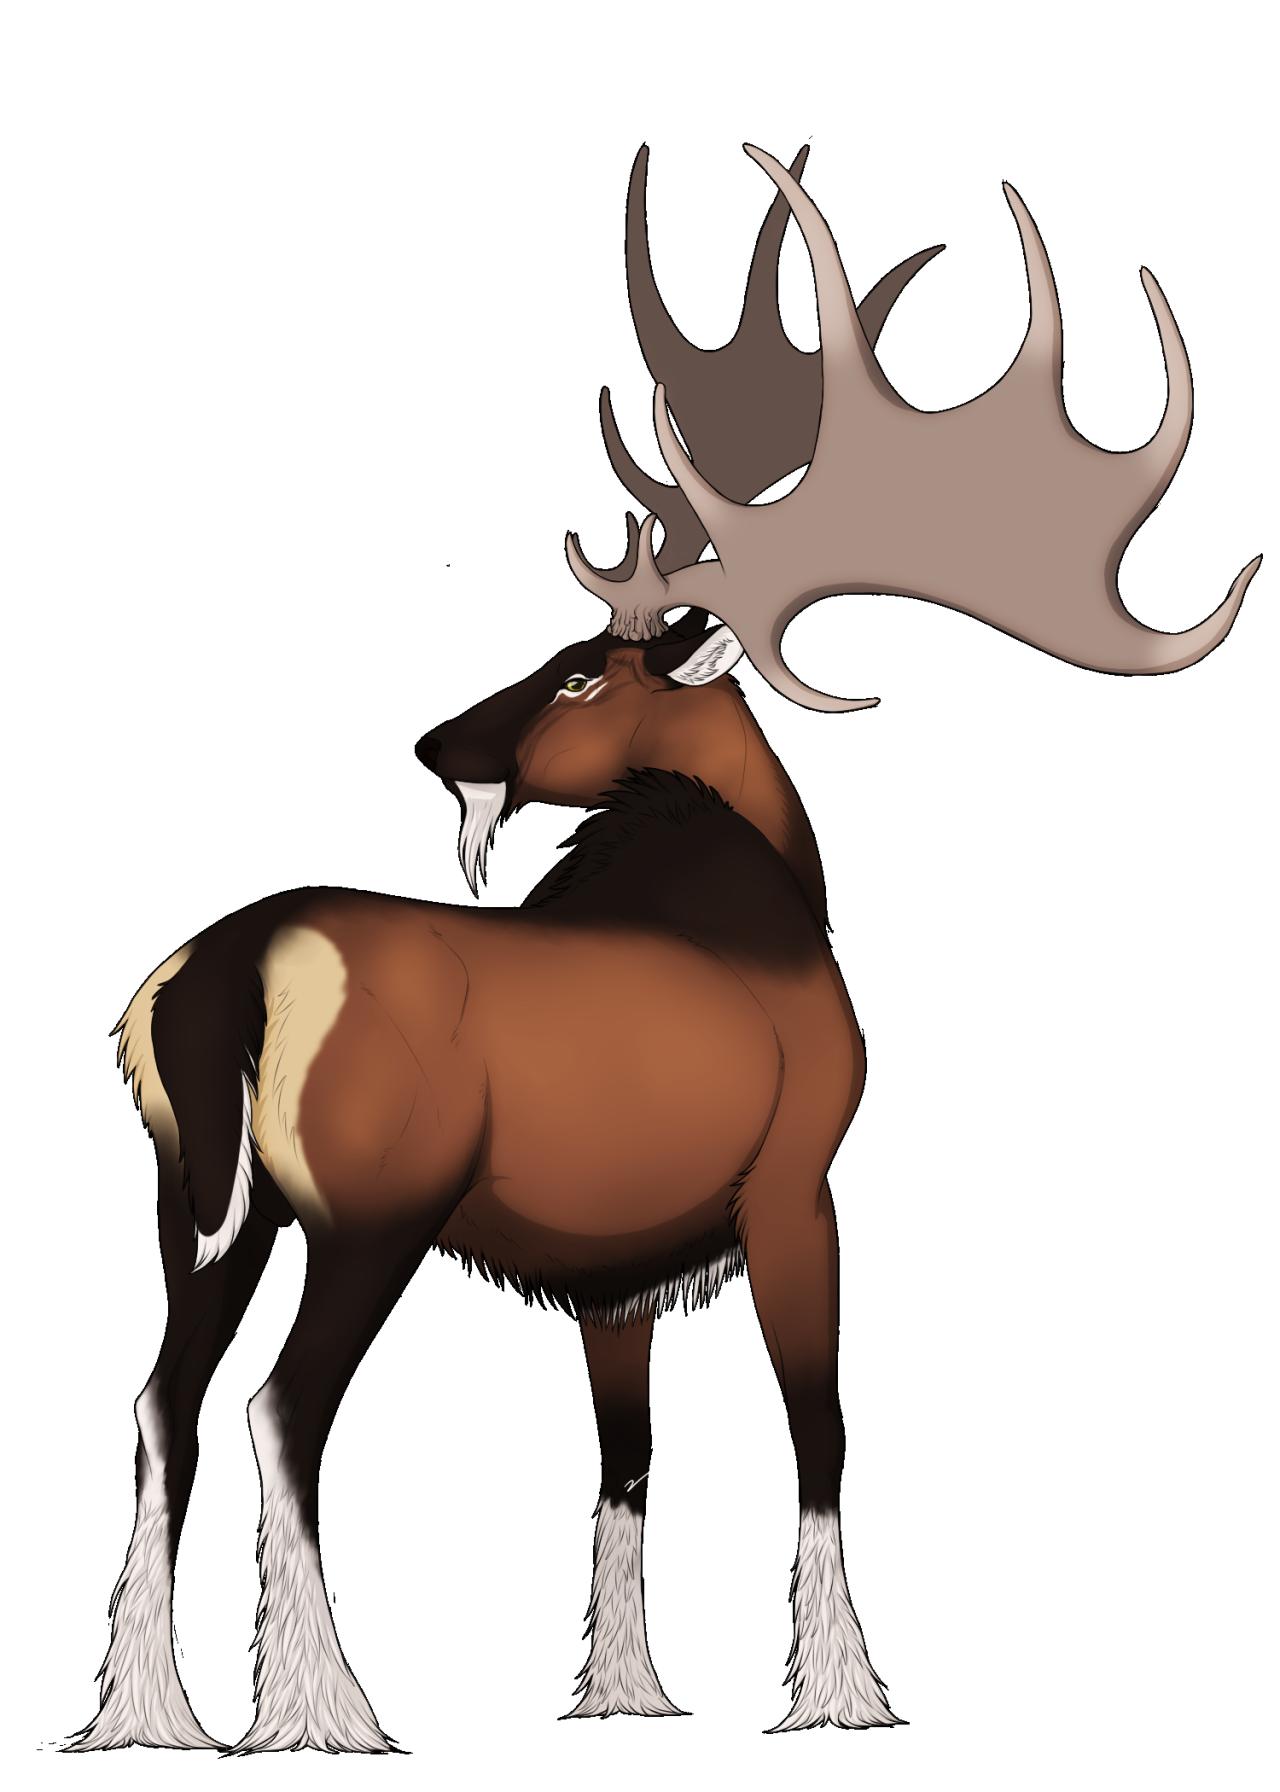 Elk clipart sambar deer. The magus stag elliot